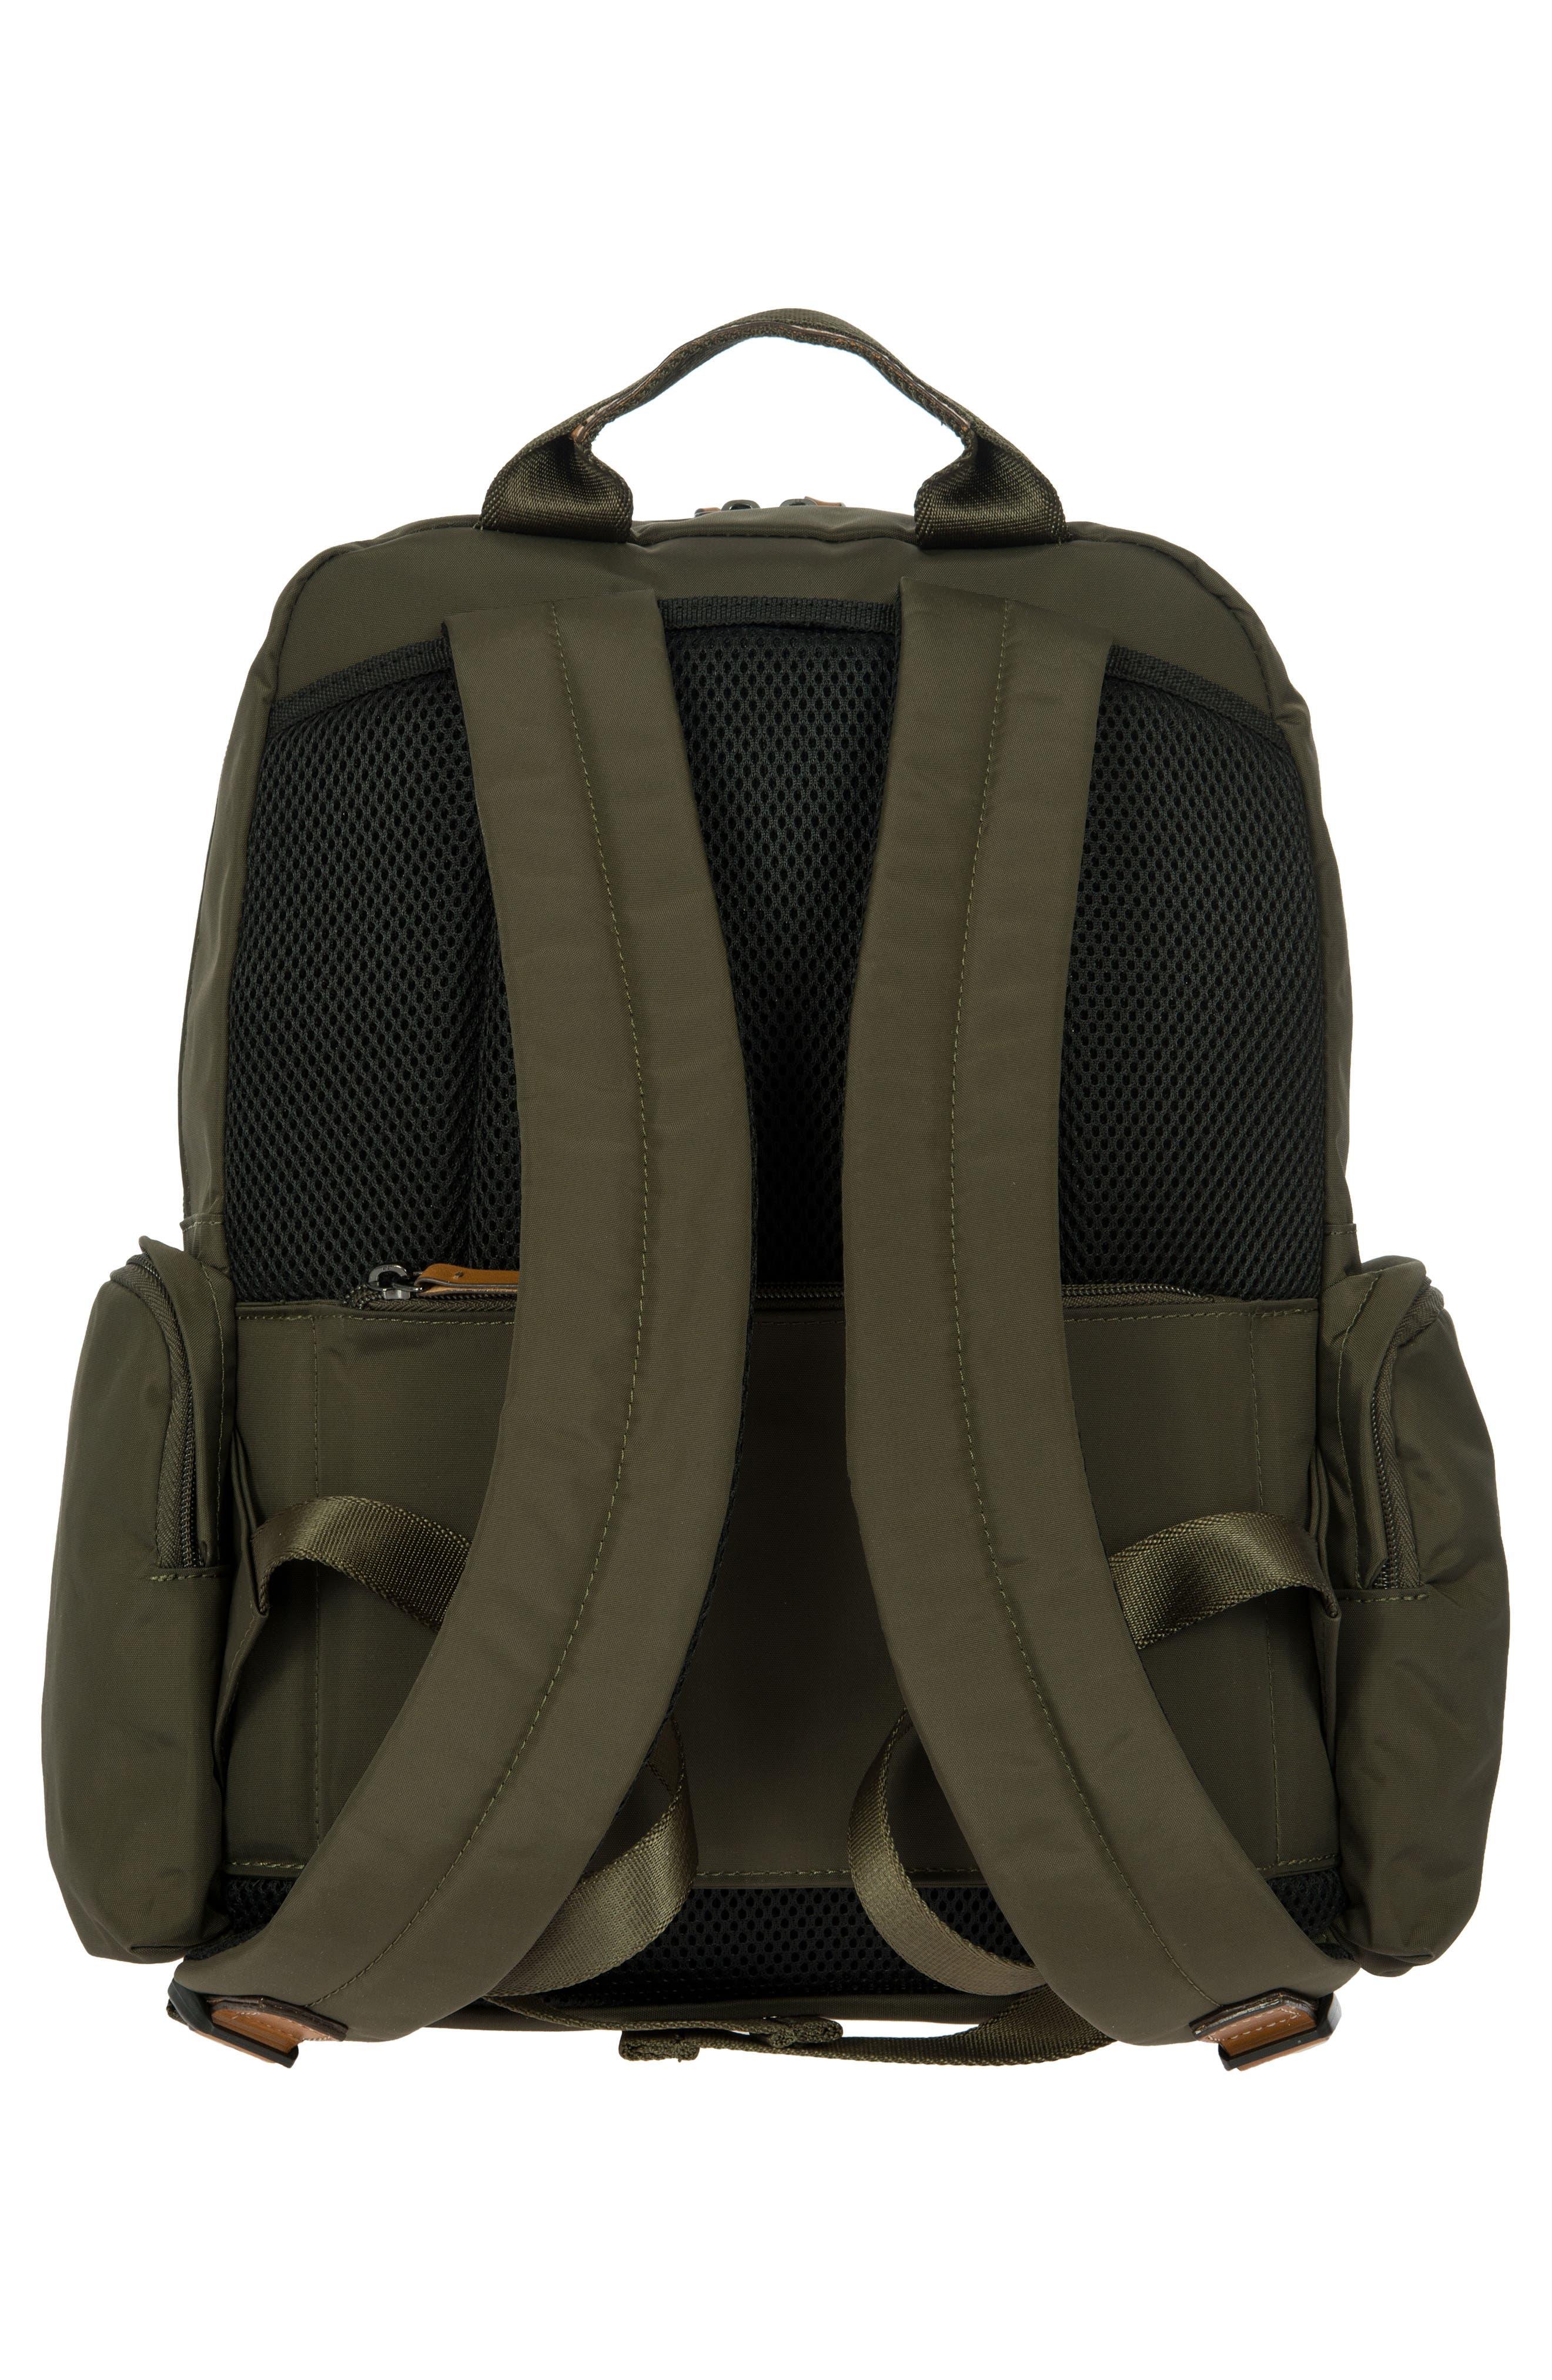 X-Travel Nomad Backpack,                             Alternate thumbnail 2, color,                             Olive